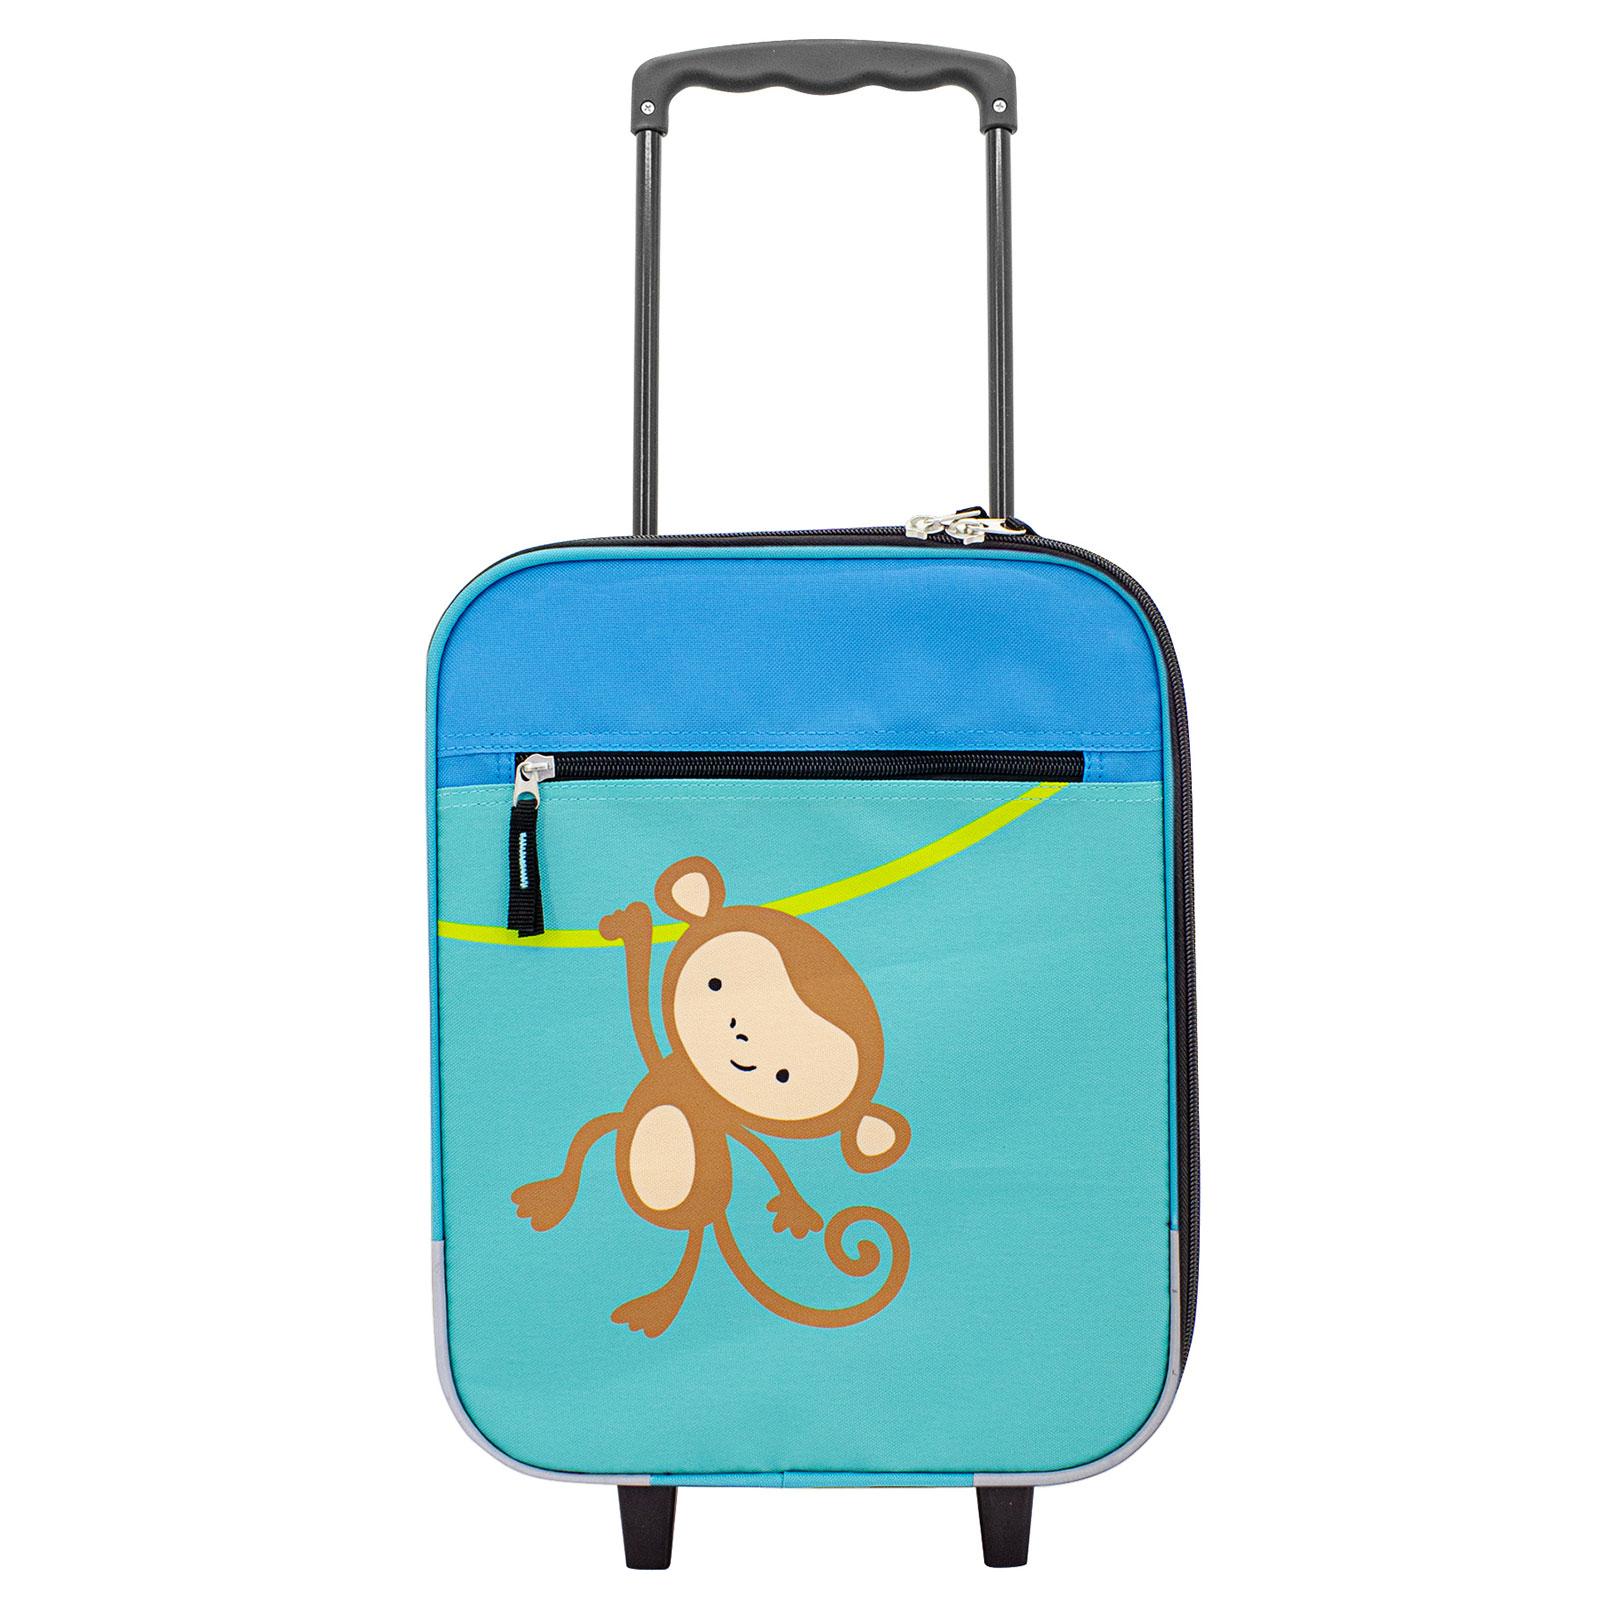 Koffer F23 Jungen Kinderkoffer Affe 43 cm 2 Rollen, Blau